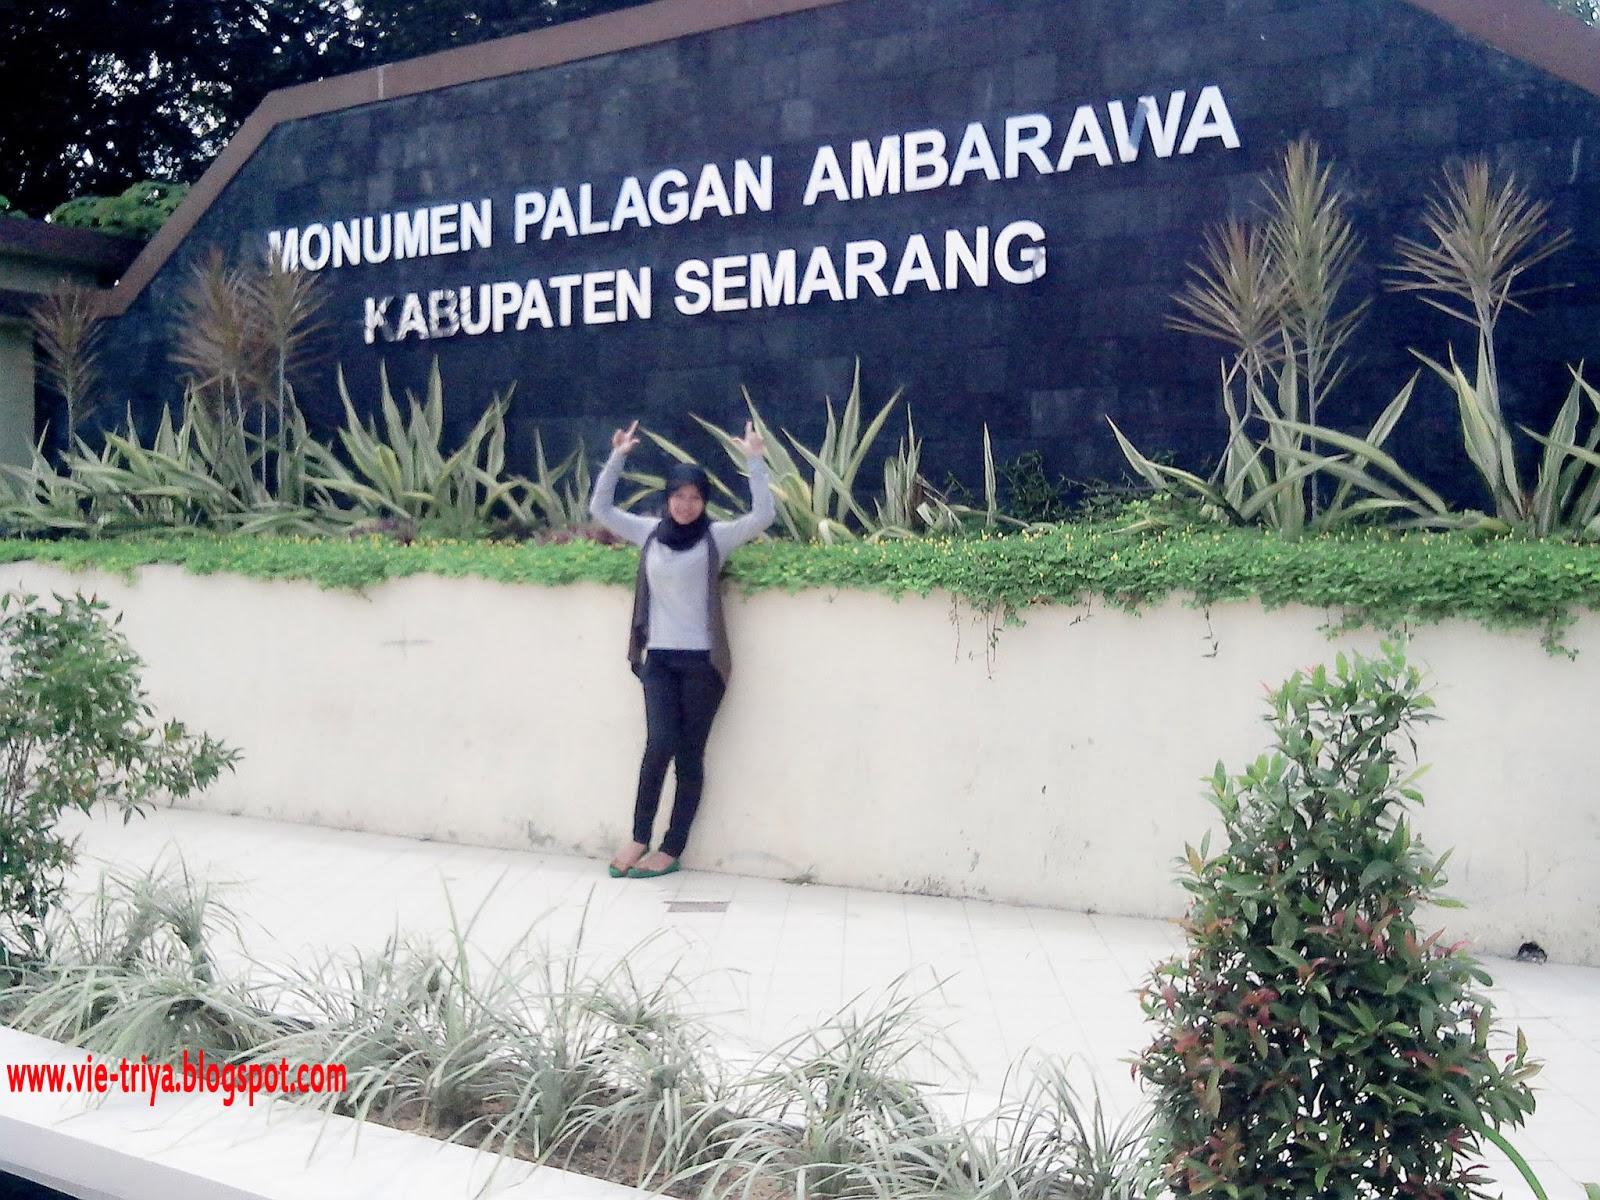 Monumen Palagan Ambarawa Numpang Nitip Minta Intip Tempat Wisata Terletak